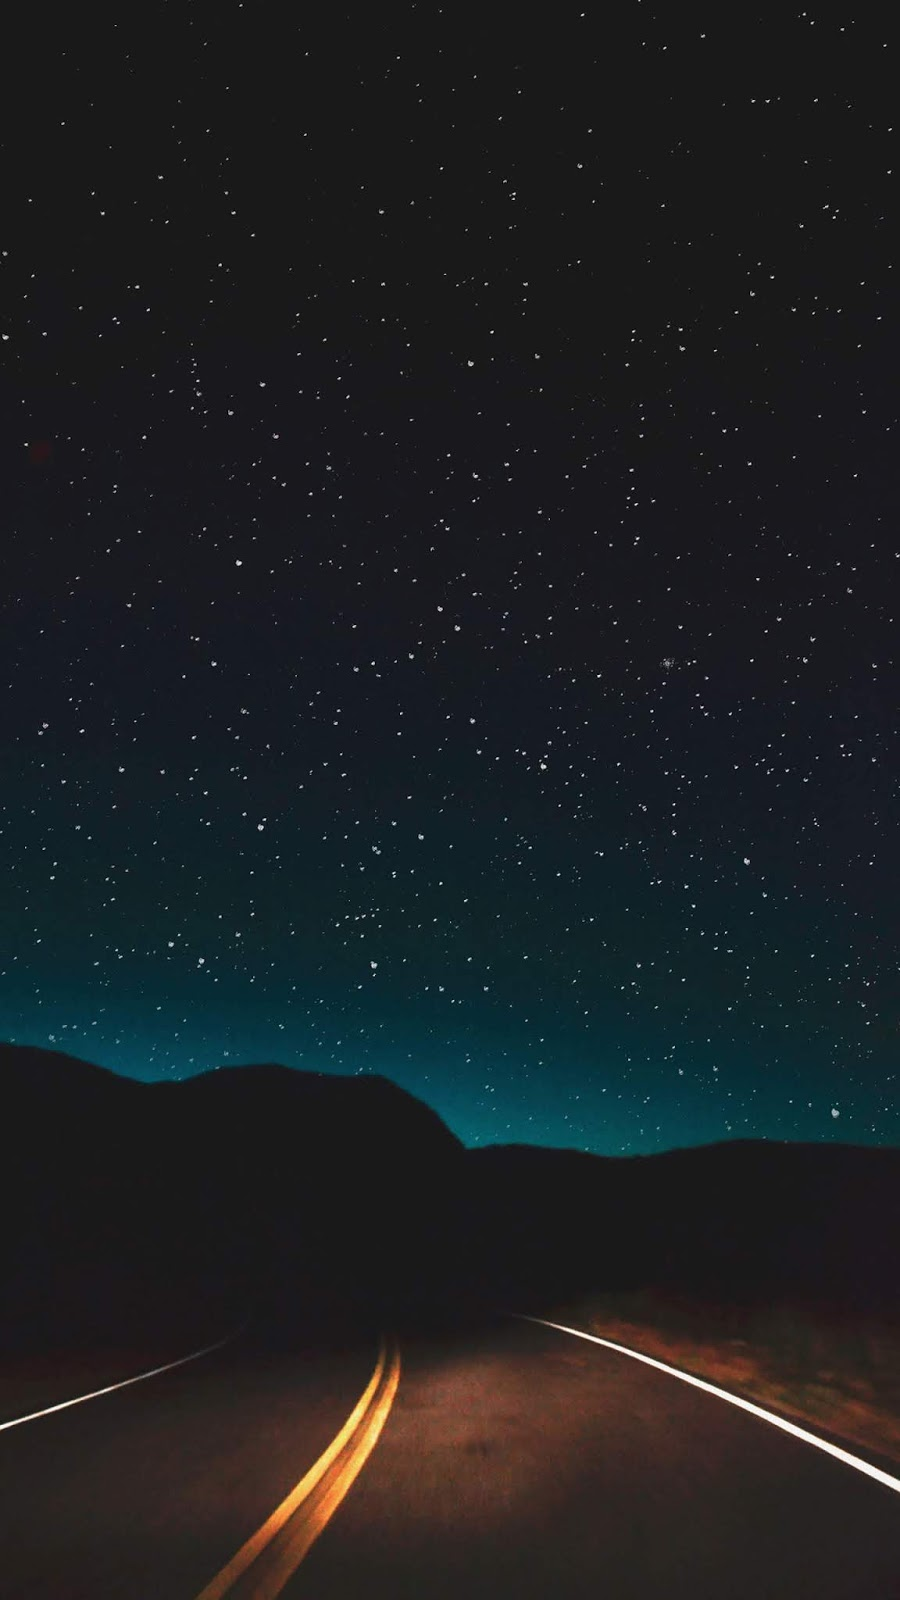 Road in the night sky